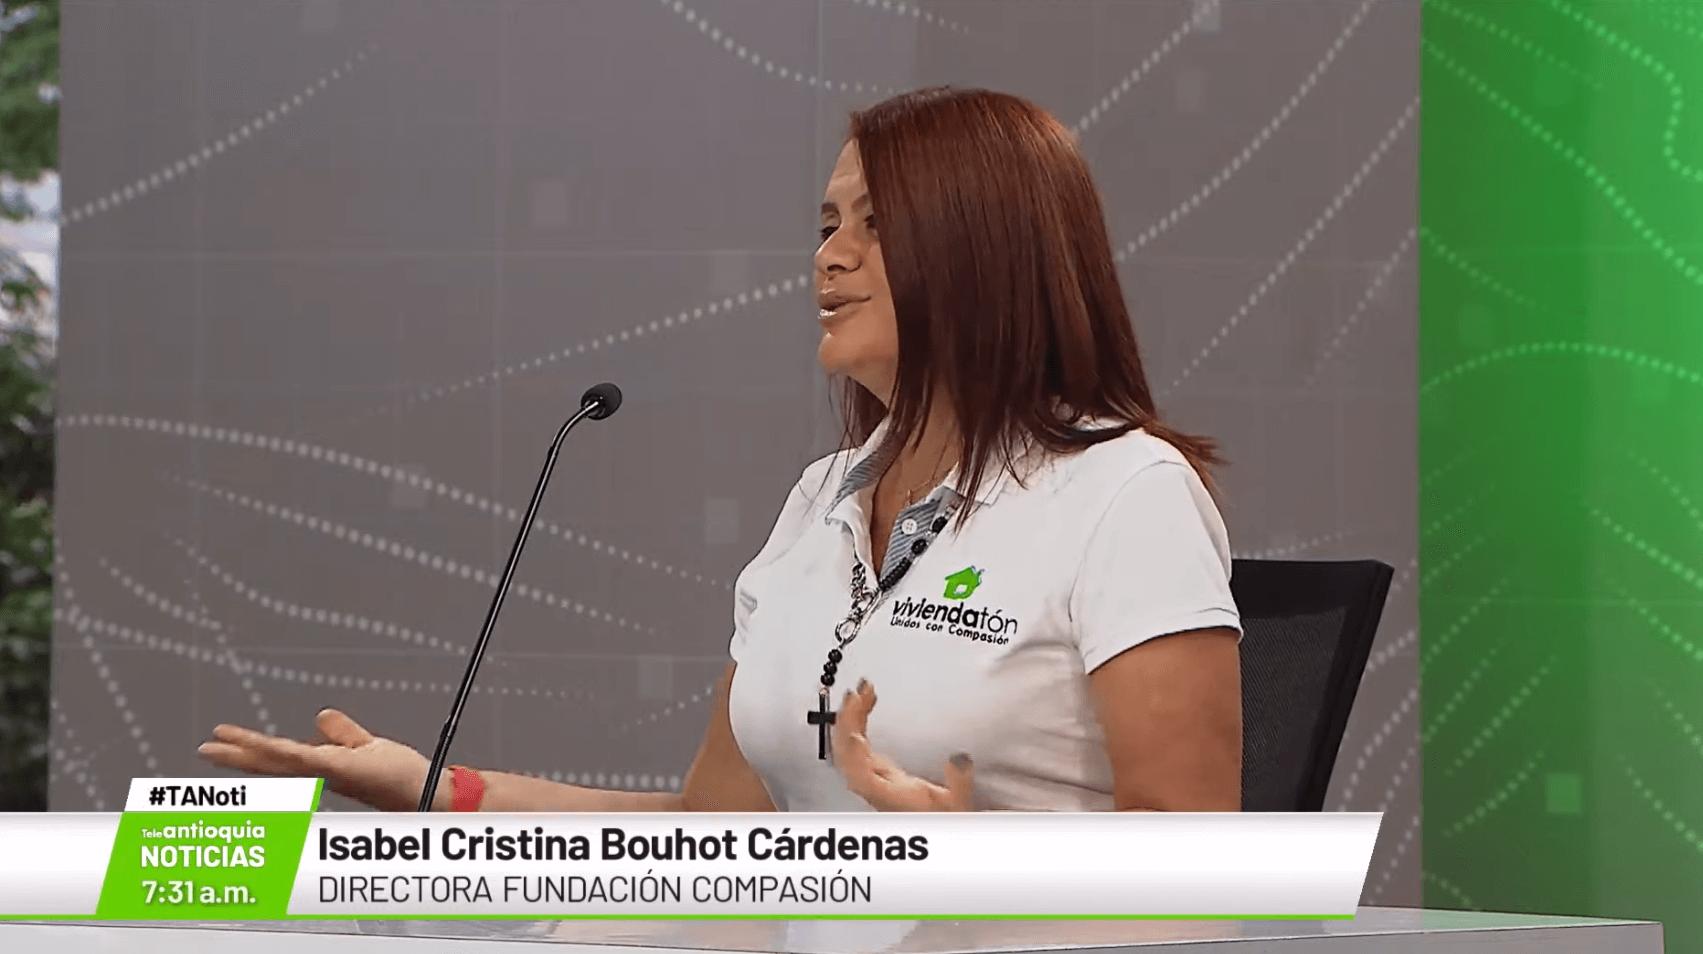 Isabel Cristina Bouhot Cárdenas, directora Fundación Compasión